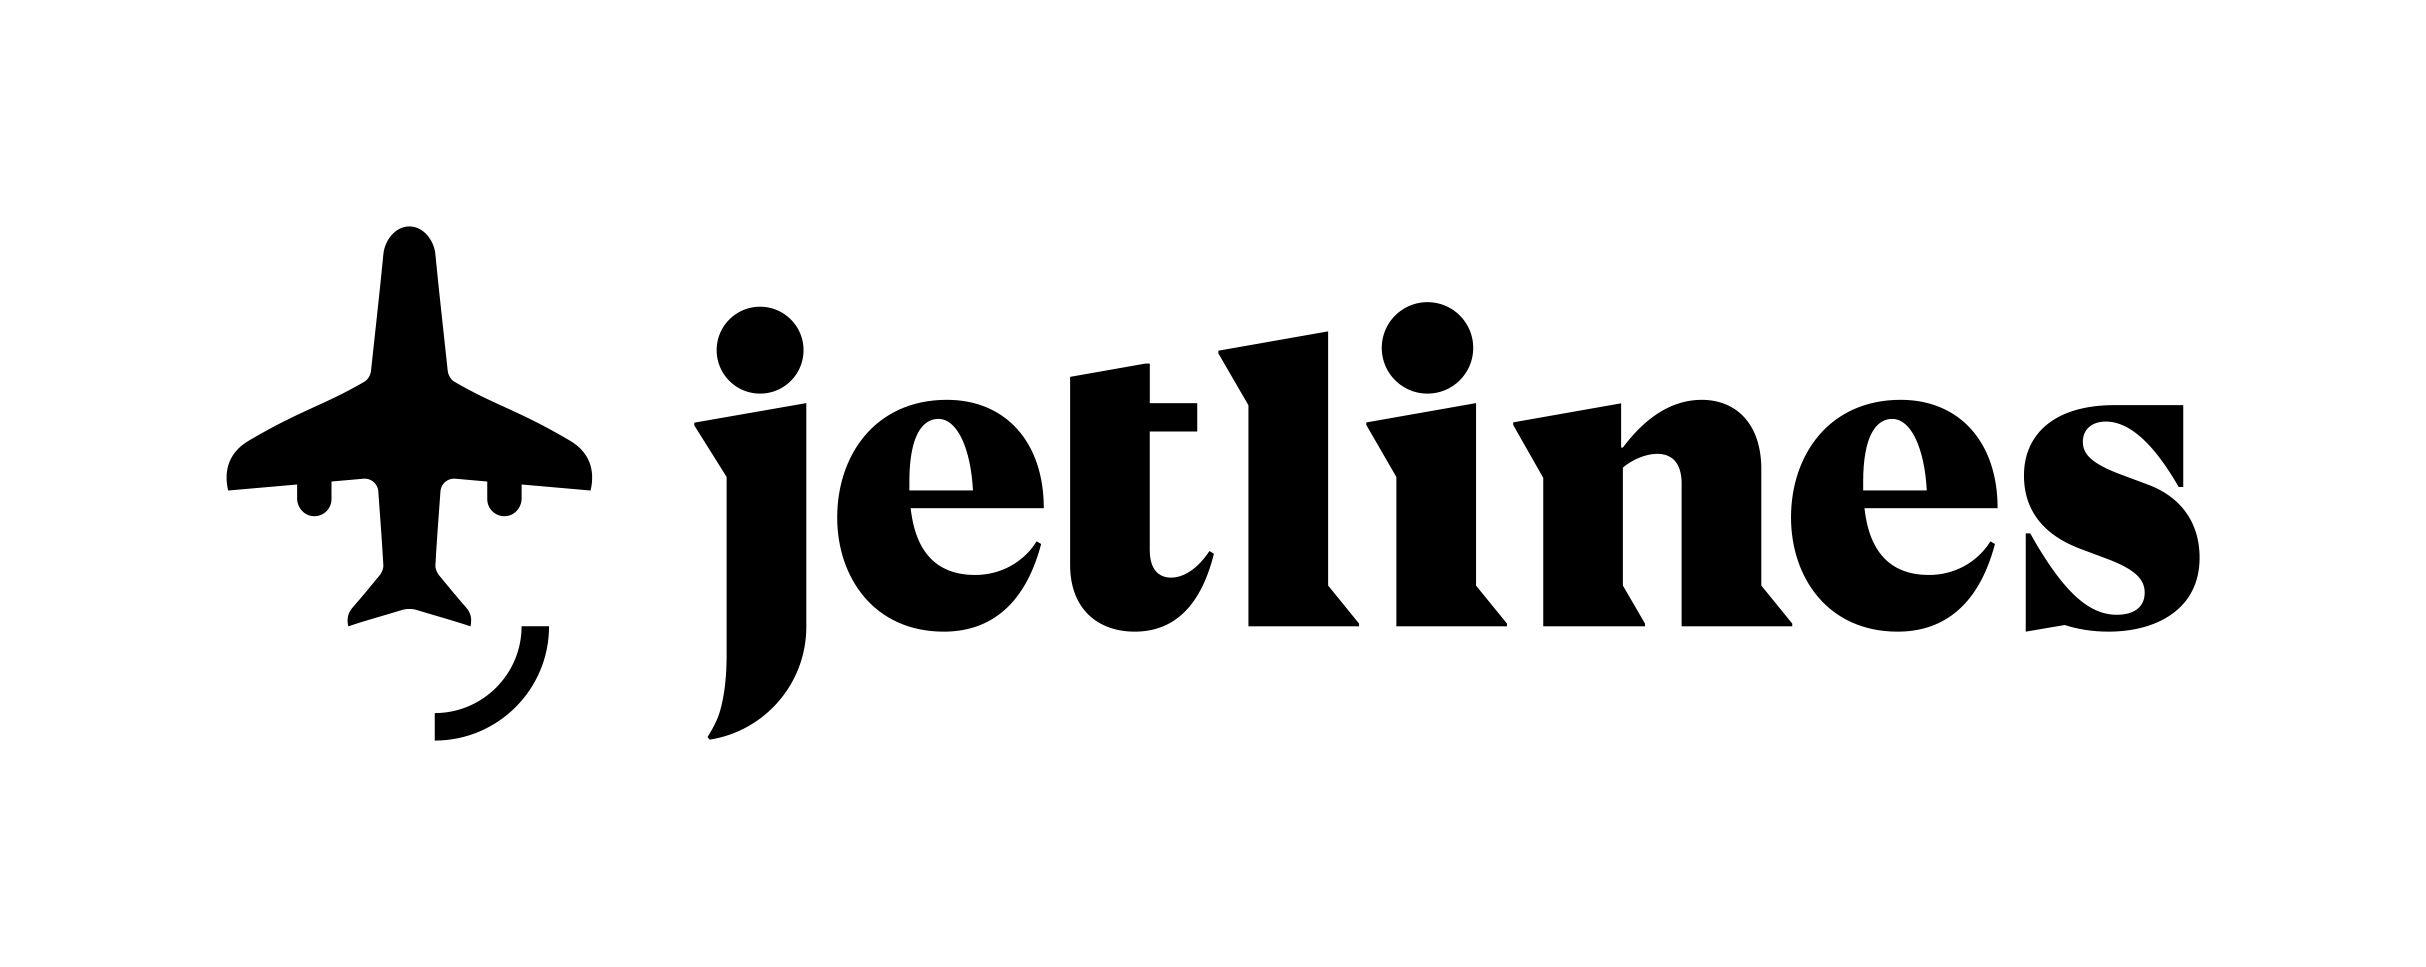 Jetlines Commences Legal Proceedings Against WestJet Co-Founder David Neeleman and Affiliates